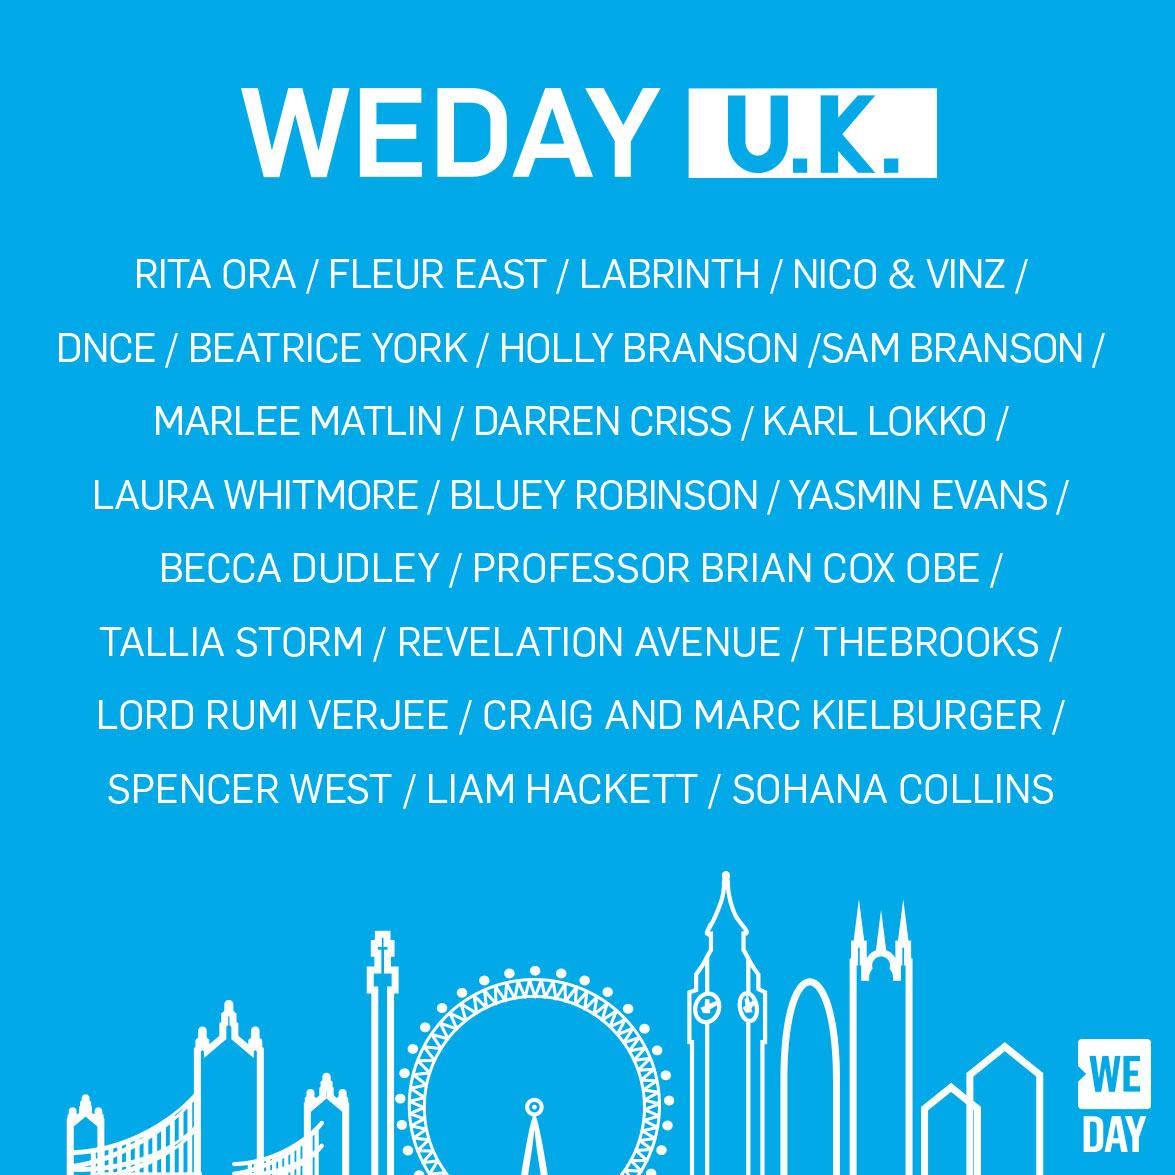 WEDAY_UK_FULL_LINEUP_BLOG_GRAPHIC_FEB29_EDIT